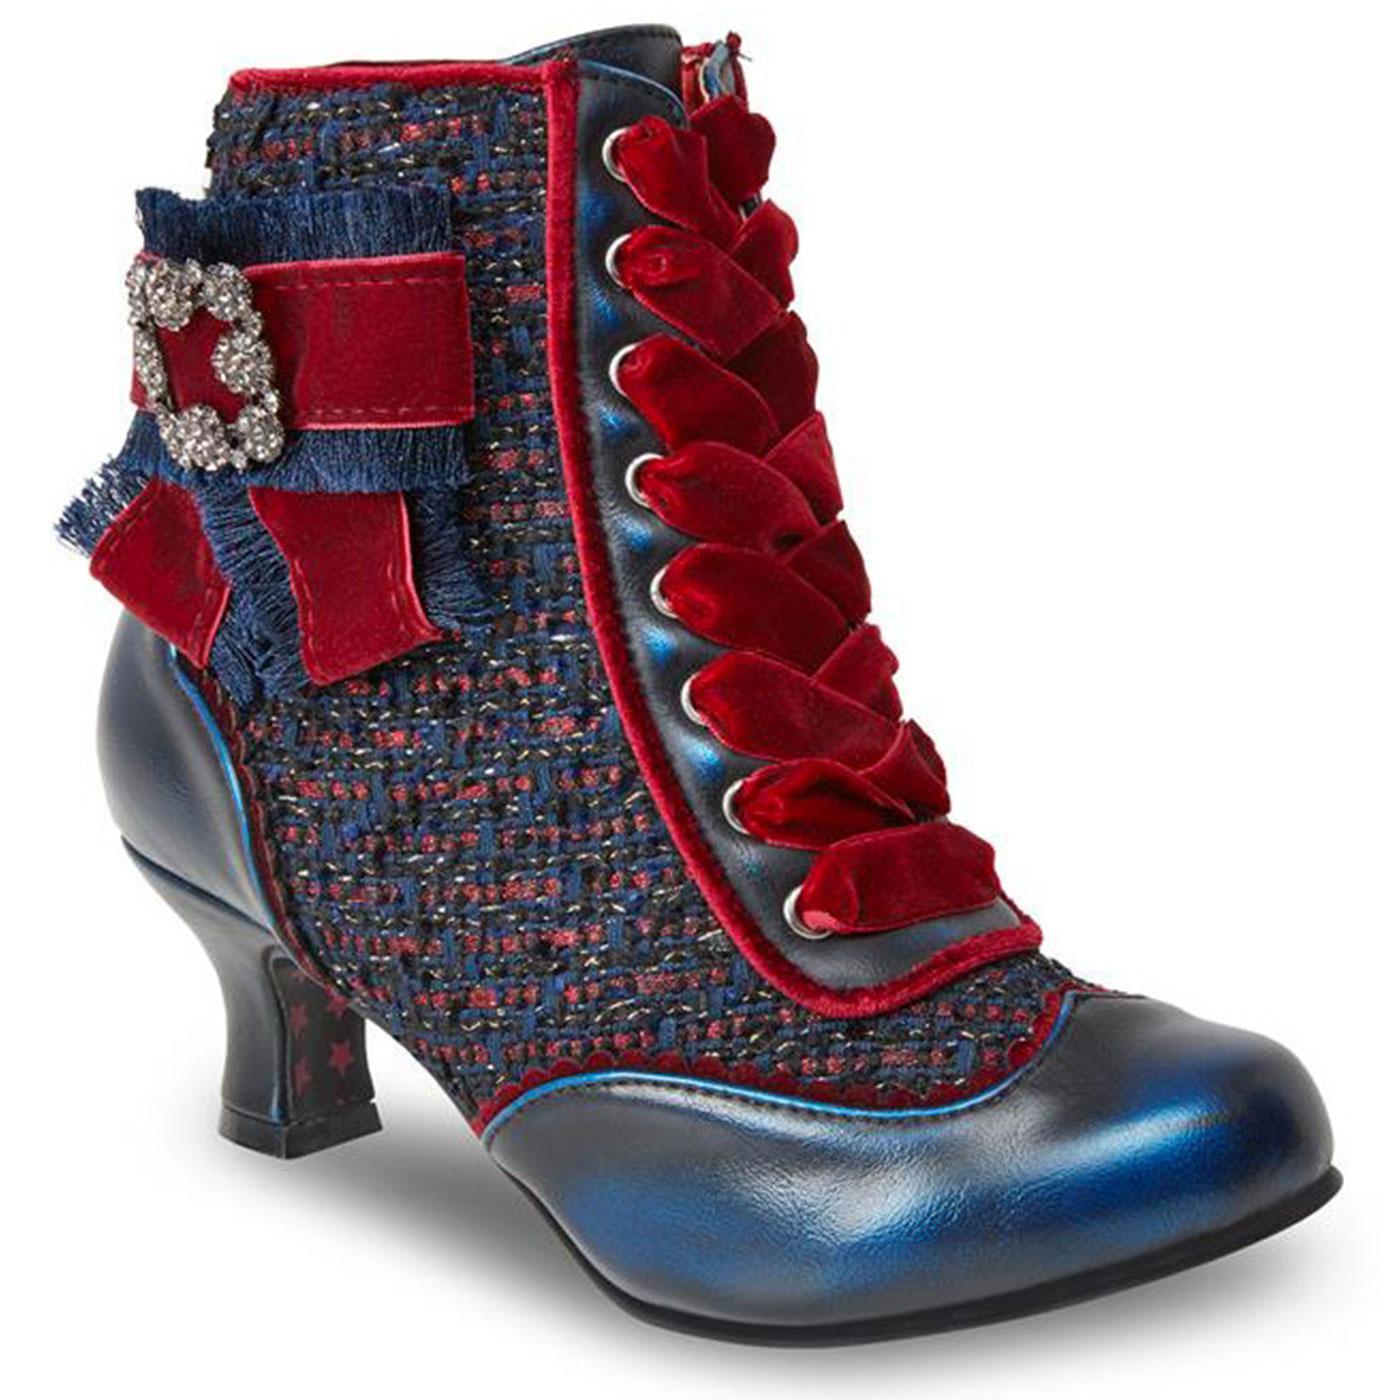 Duchess JOE BROWNS Woven Vintage Heeled Boots